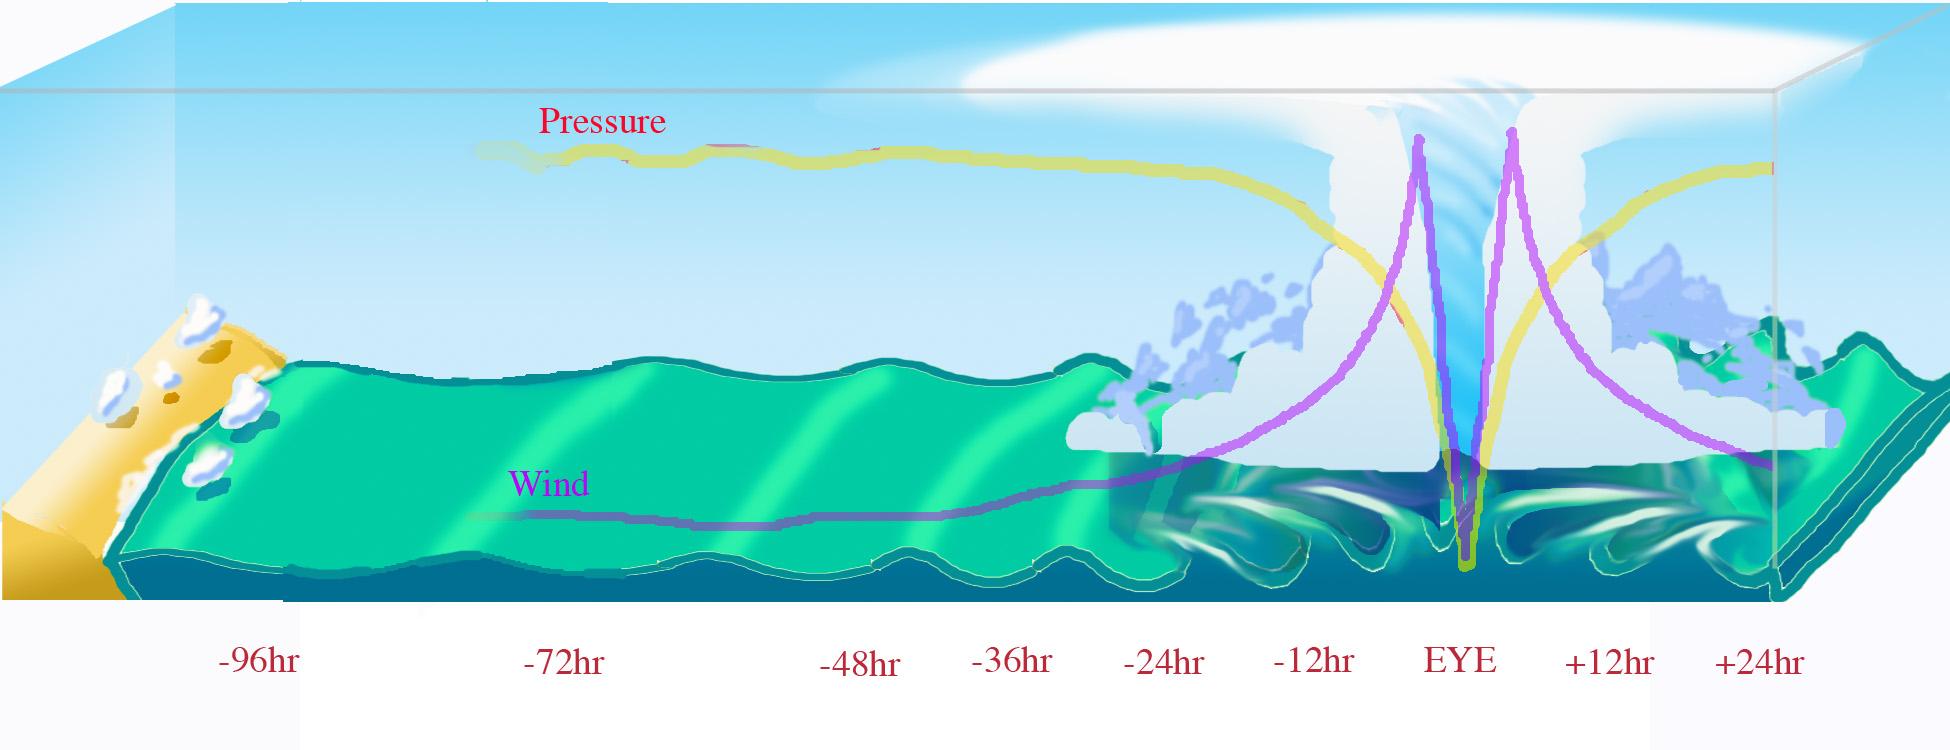 Hurrikan Ablauf Schema (NOAA)